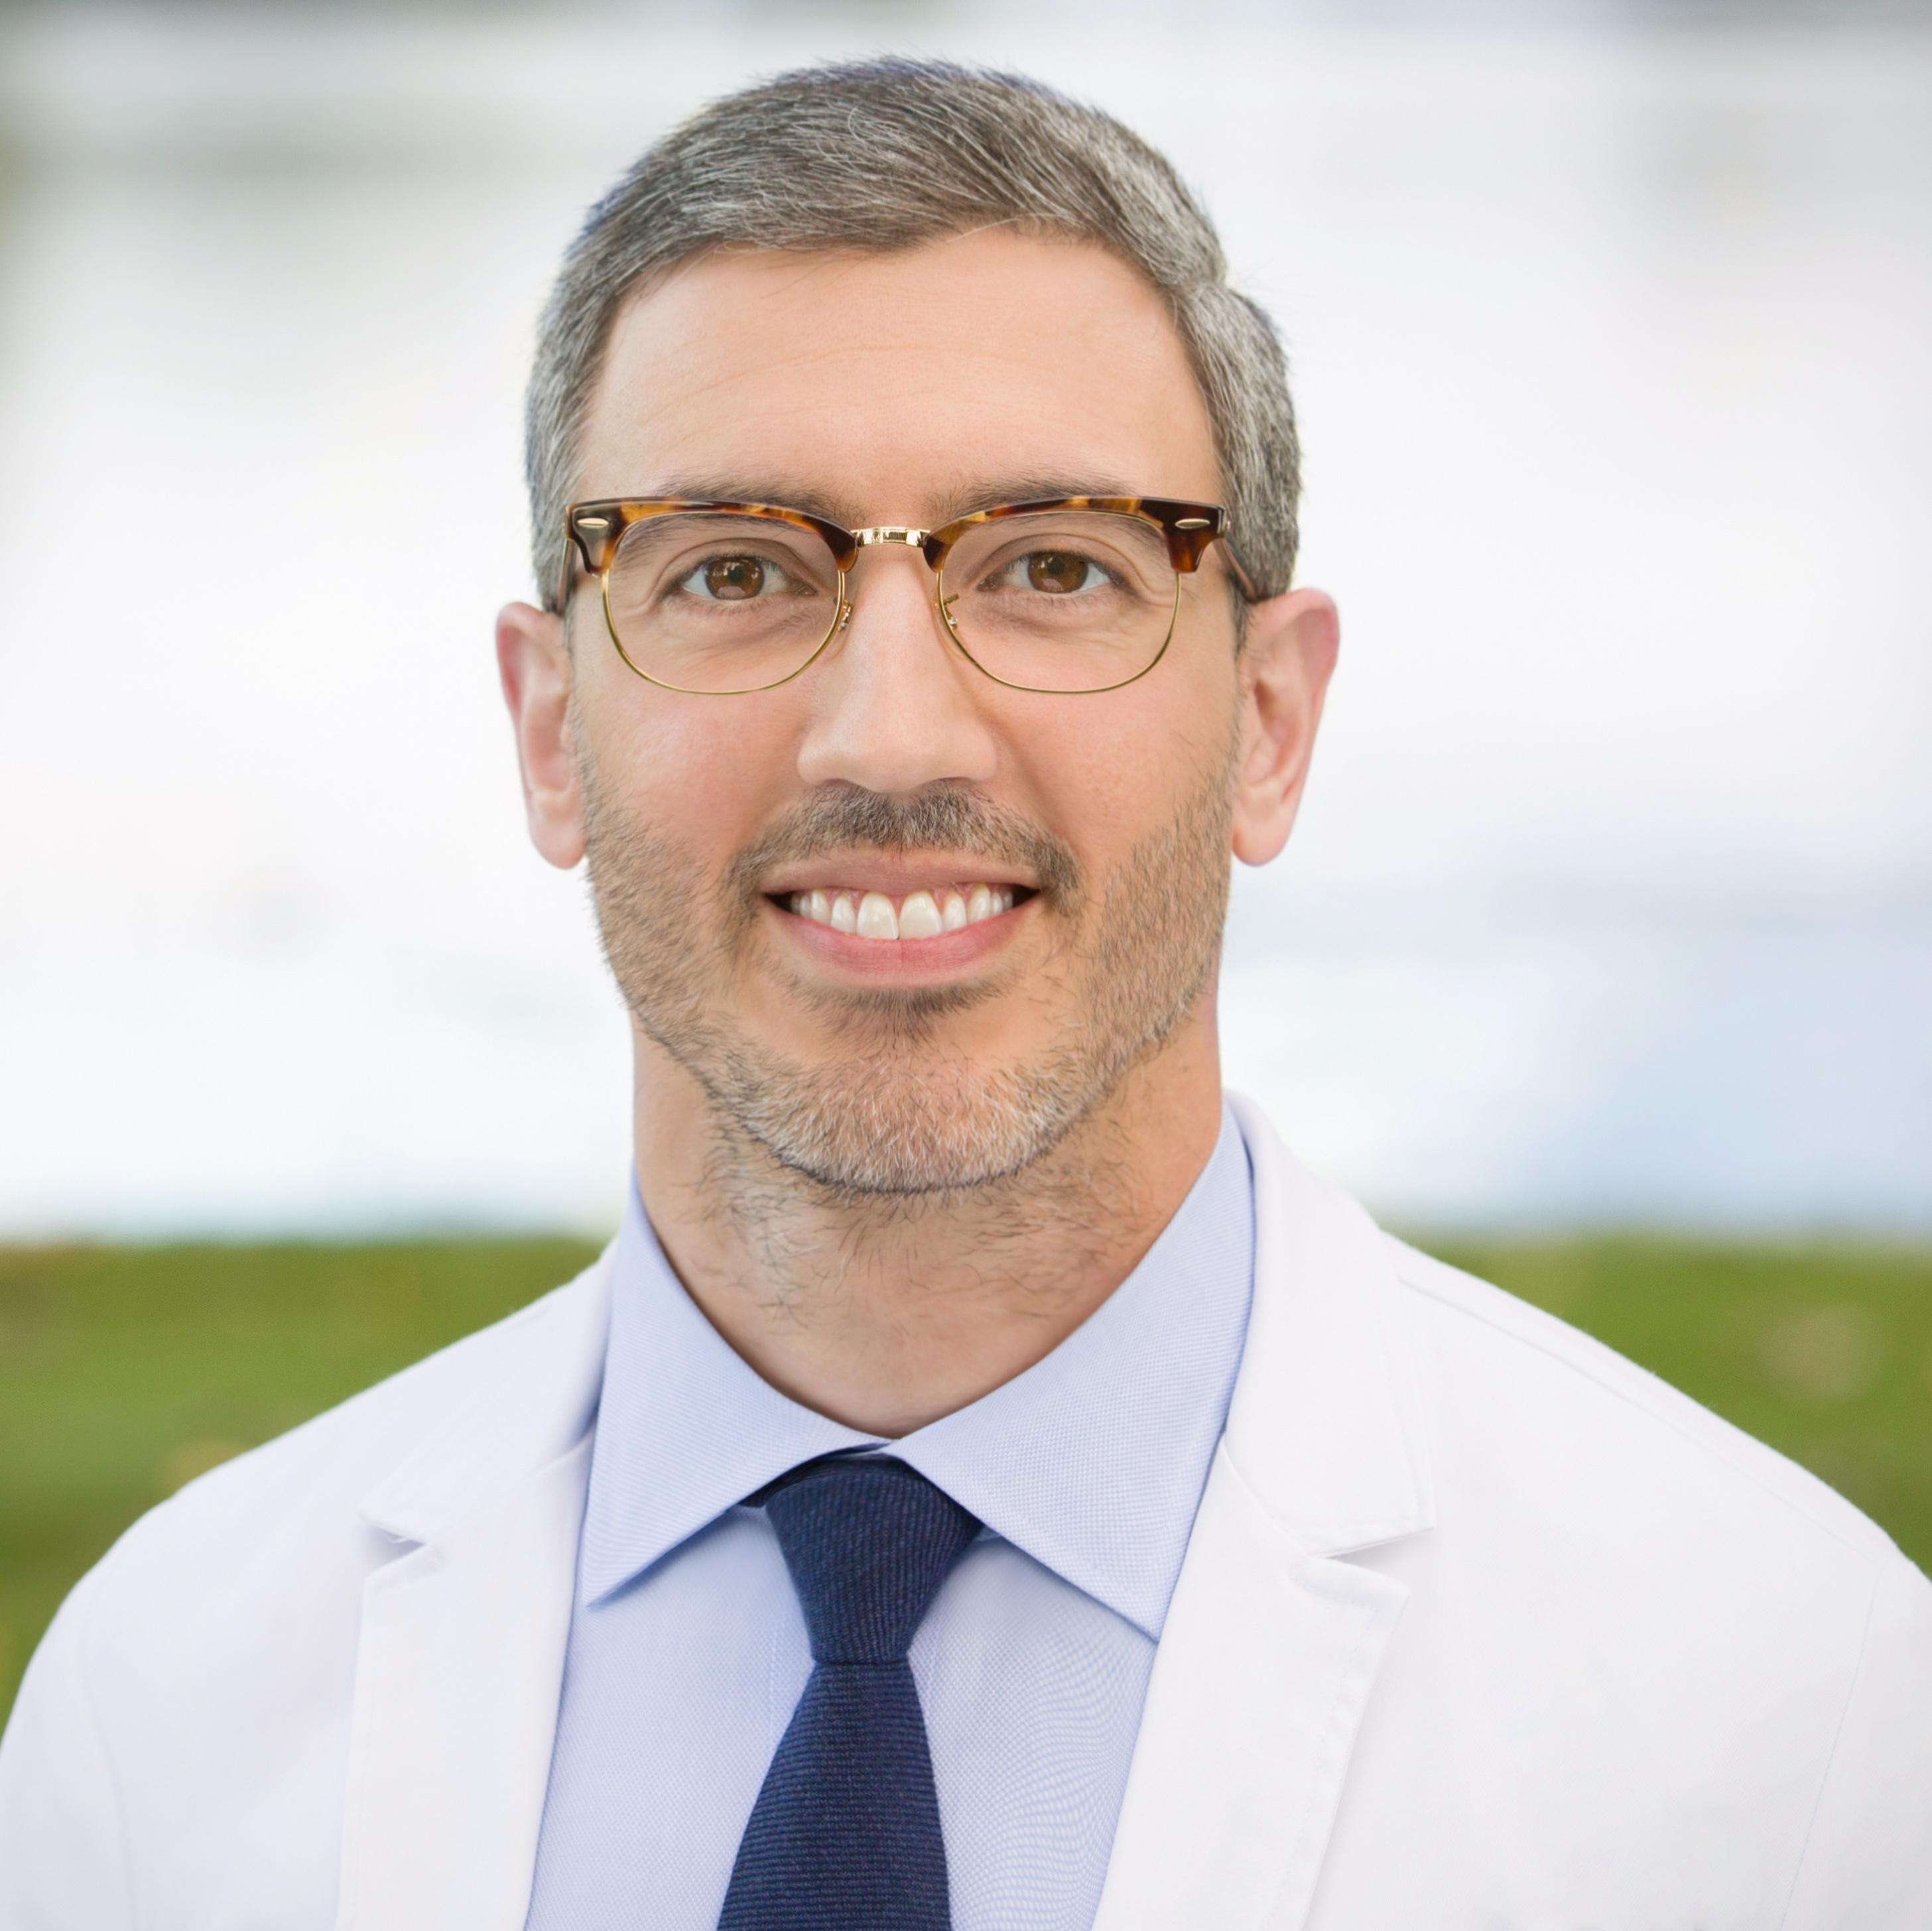 Dr. Danny Kalash